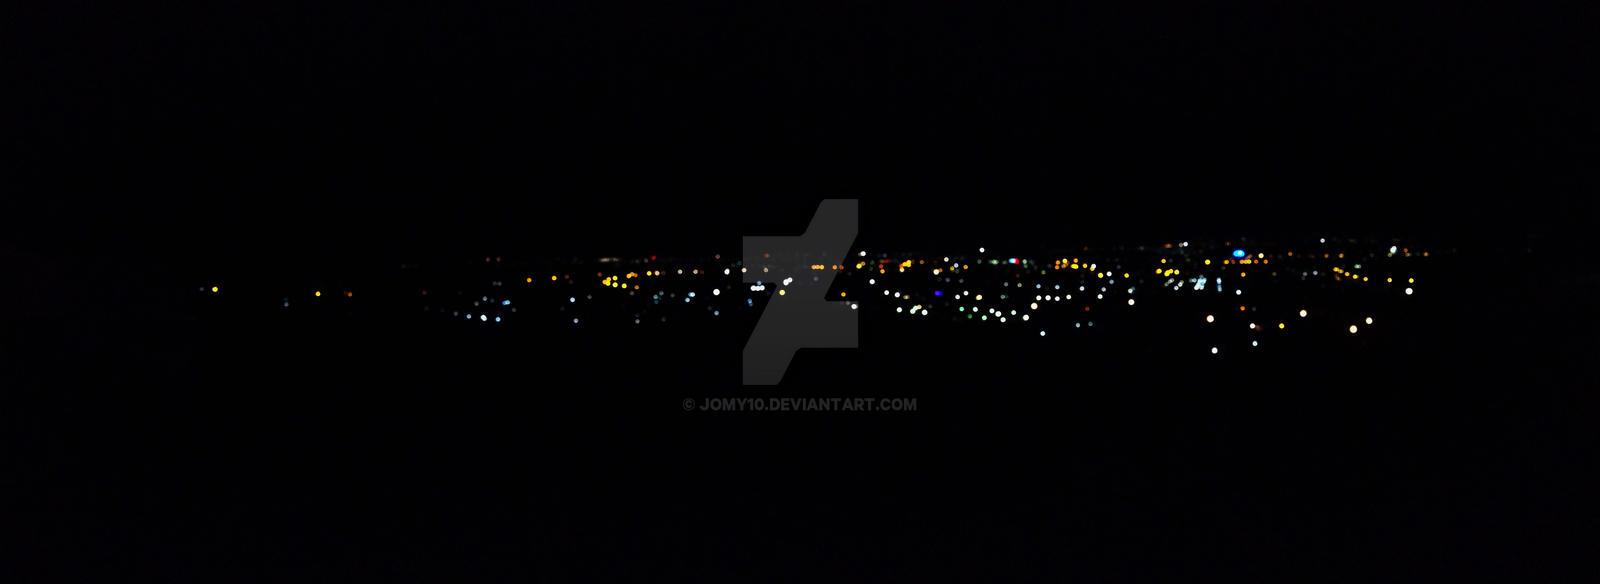 Gran Canaria - Maspalomas - View by jomy10